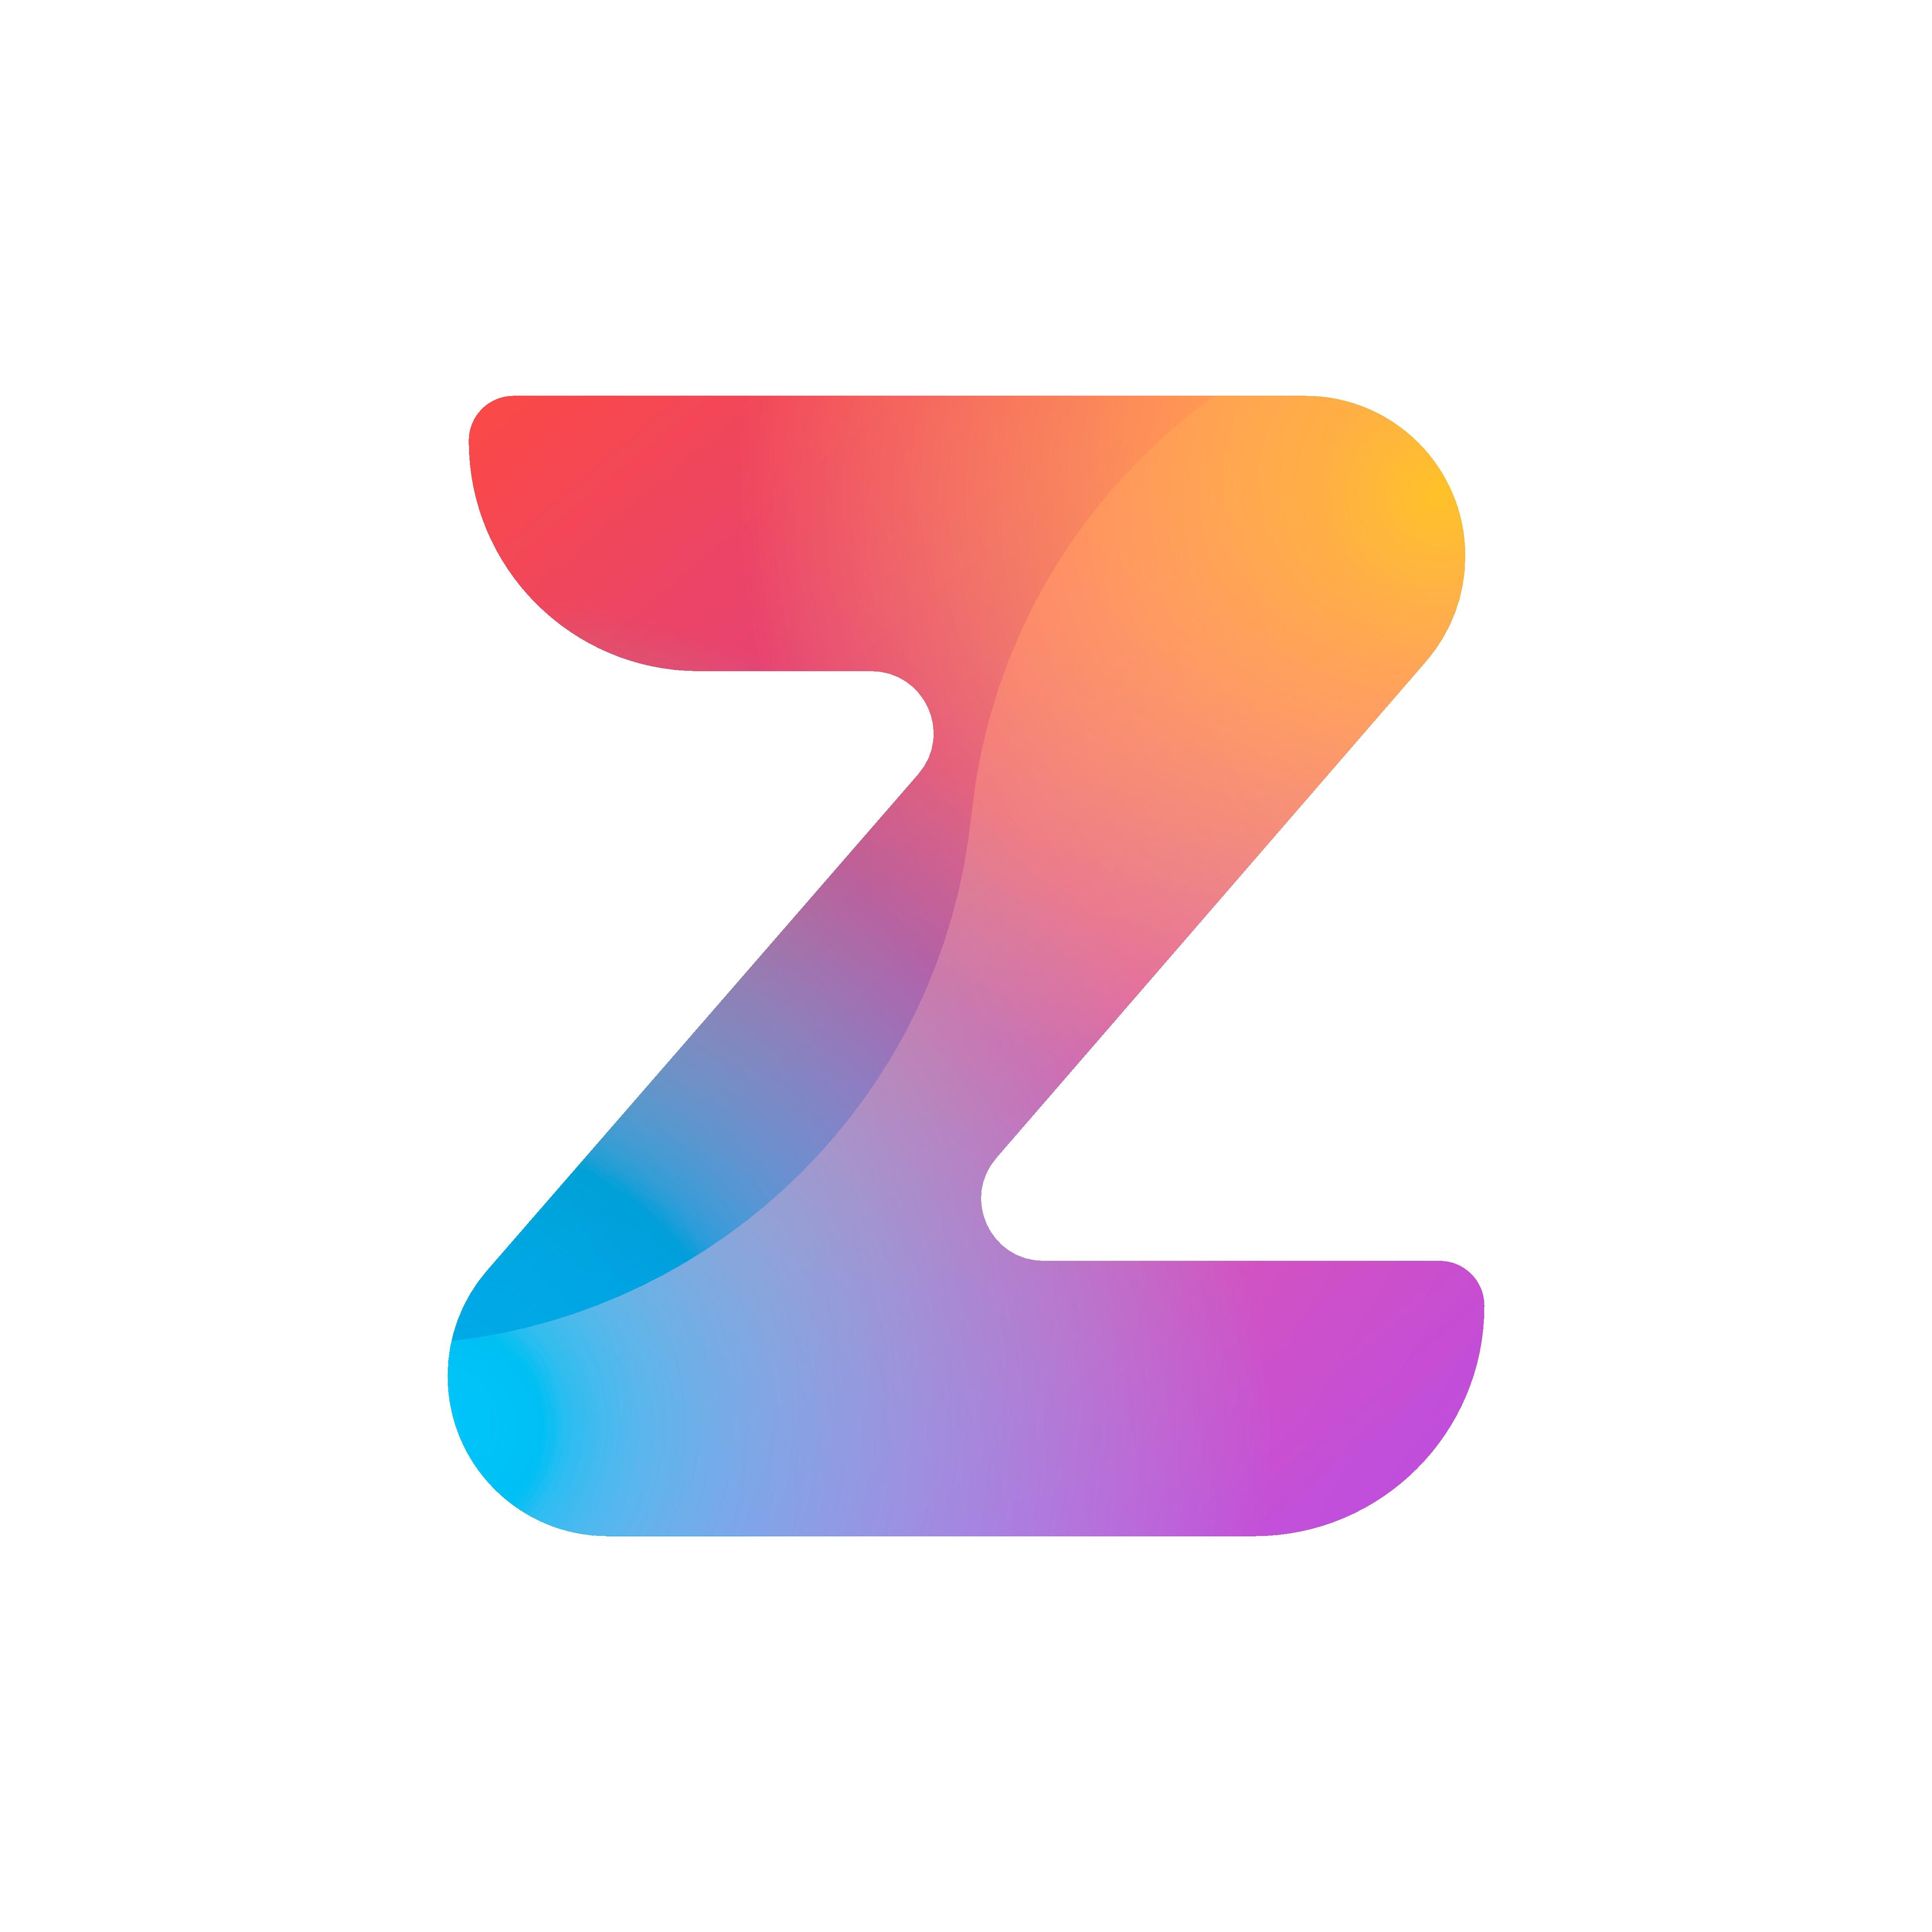 Create a colourful app icon for calendar app Zuper